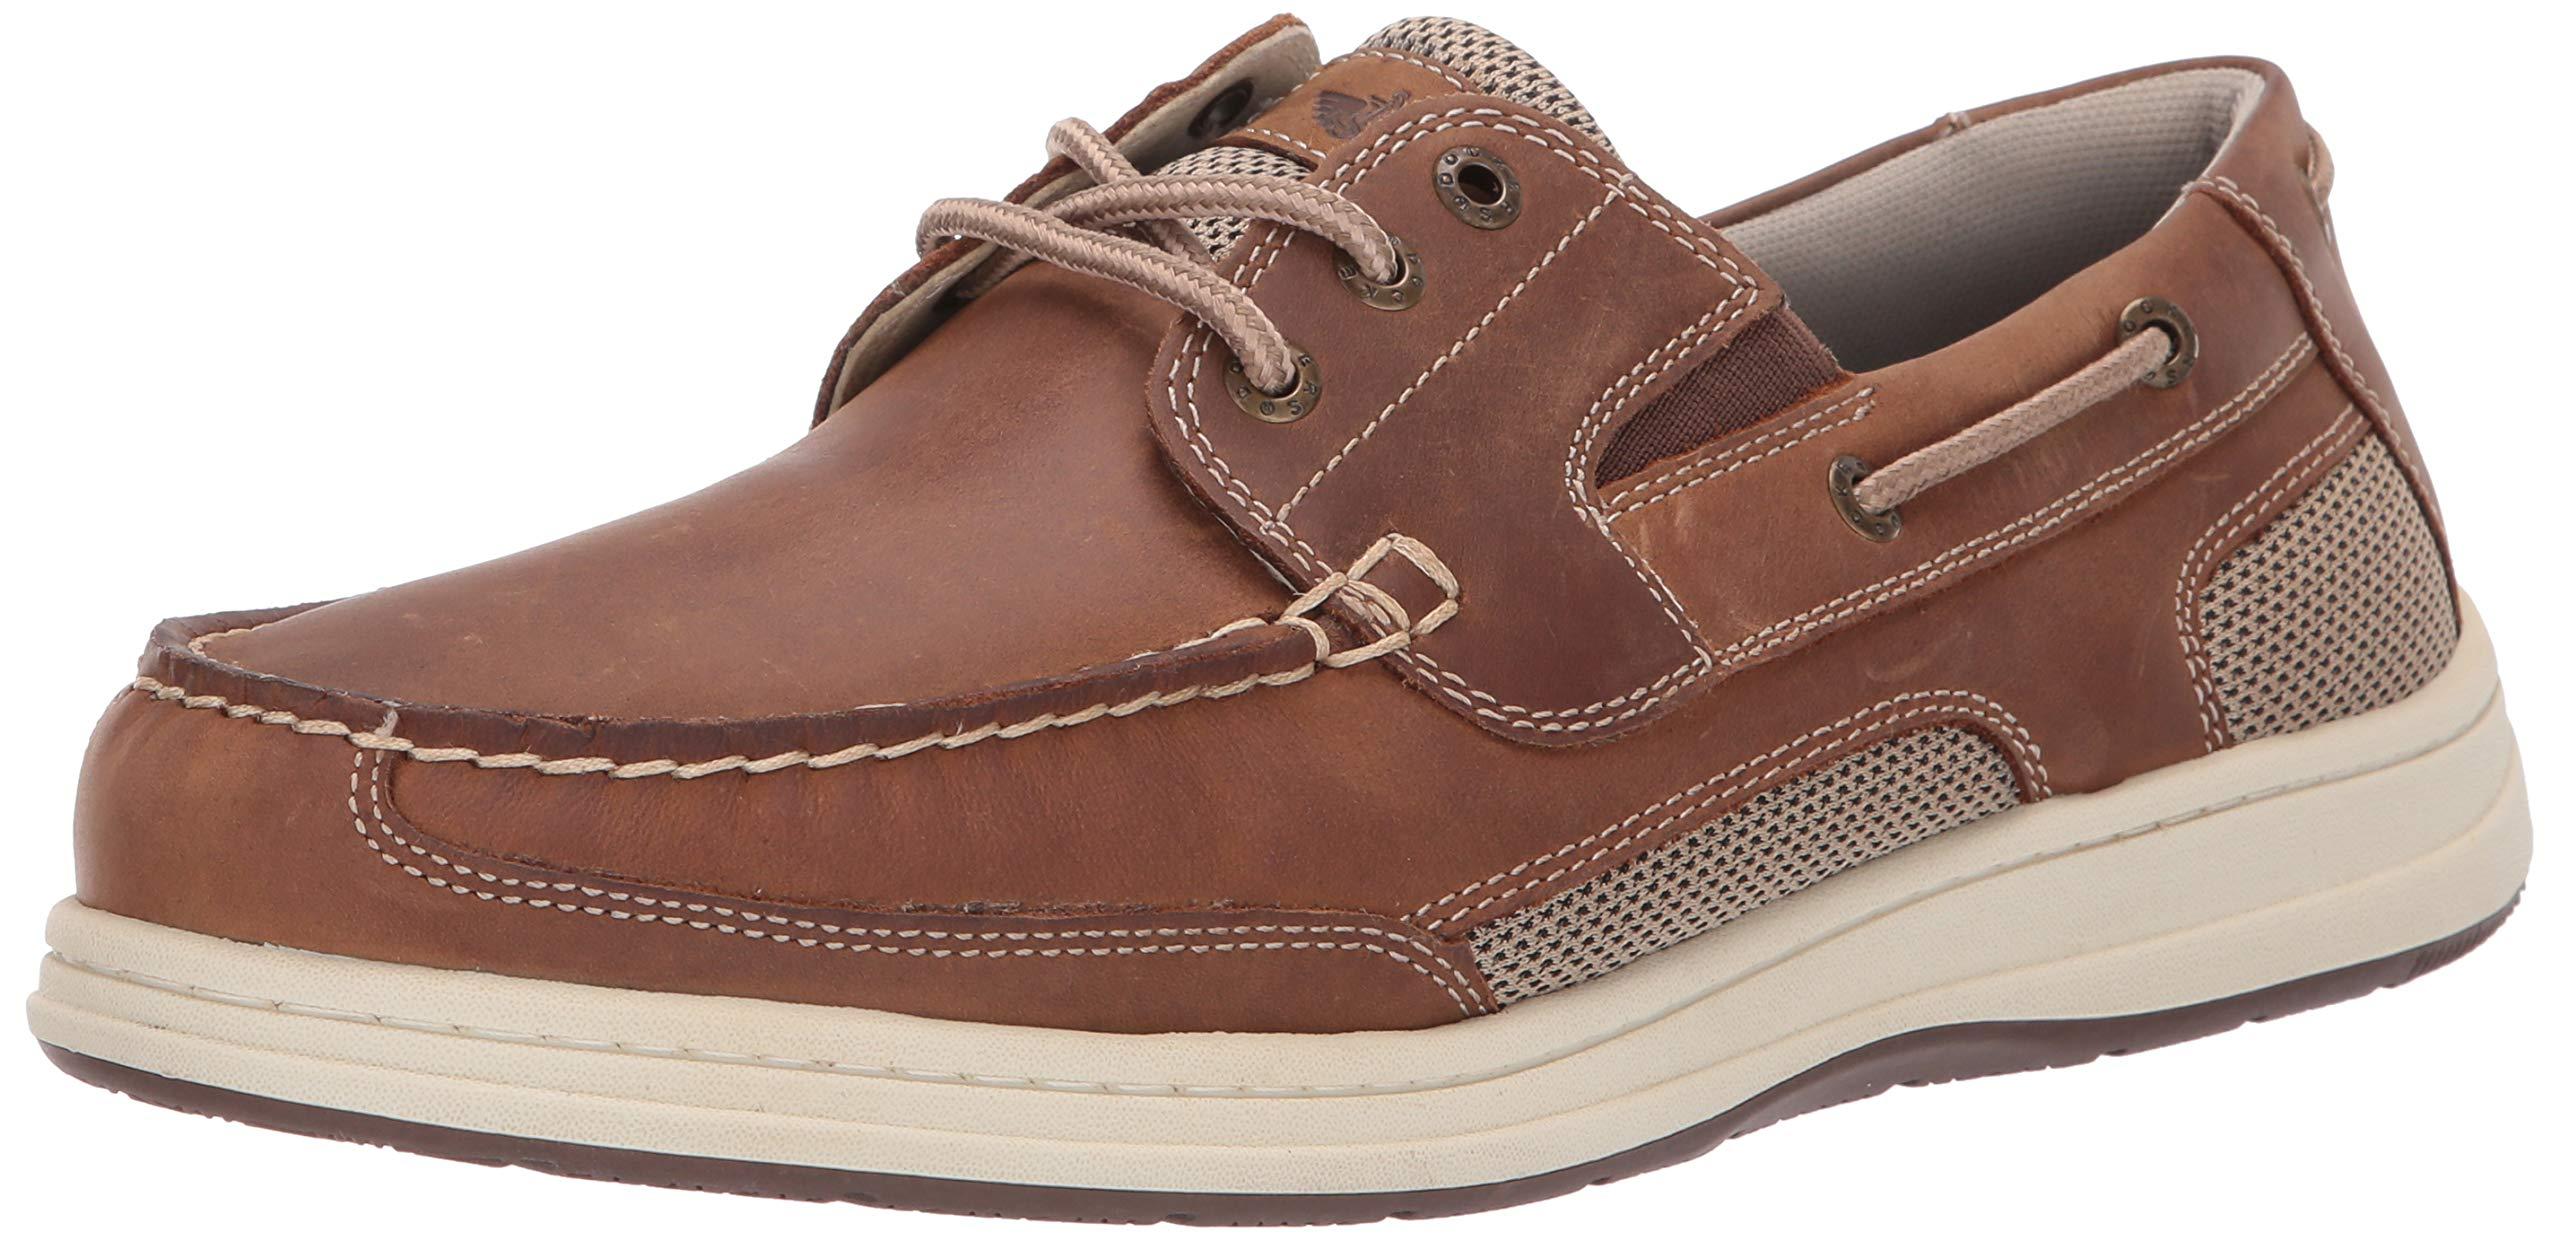 Dockers Men's Beacon Shoe, Dark Tan, 13 W US